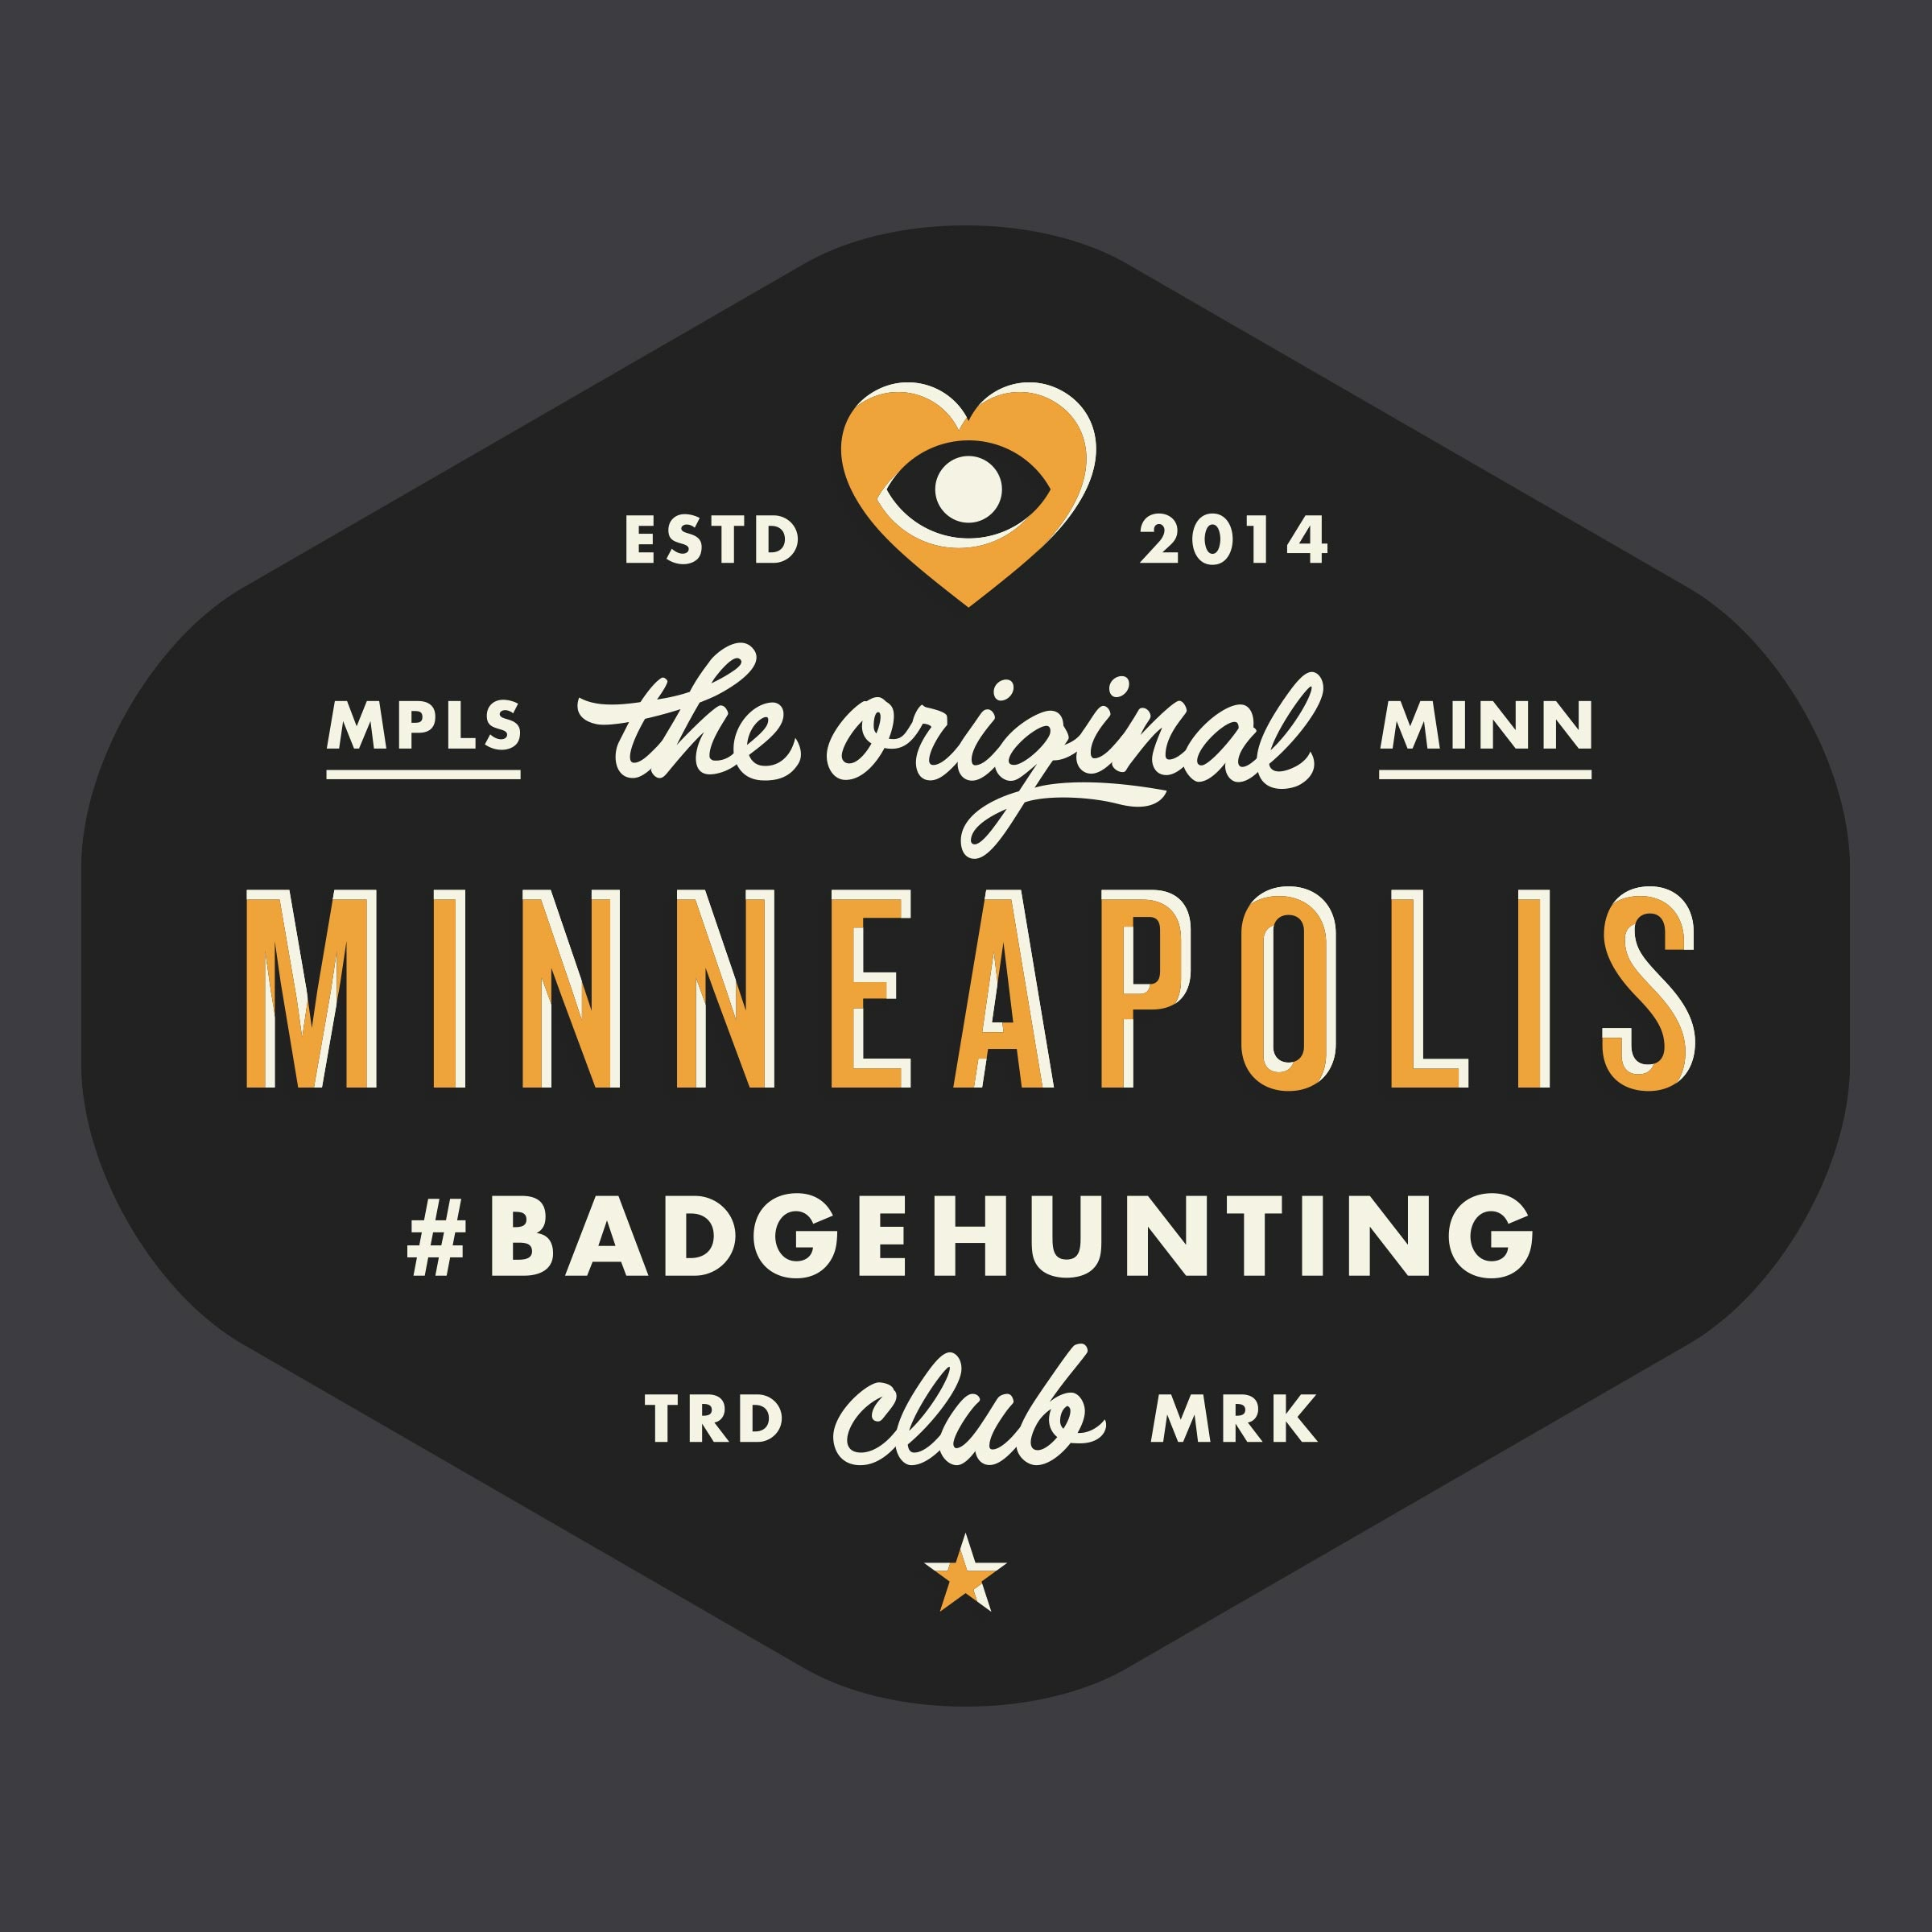 Minneapolis Badgehunting Club Detail